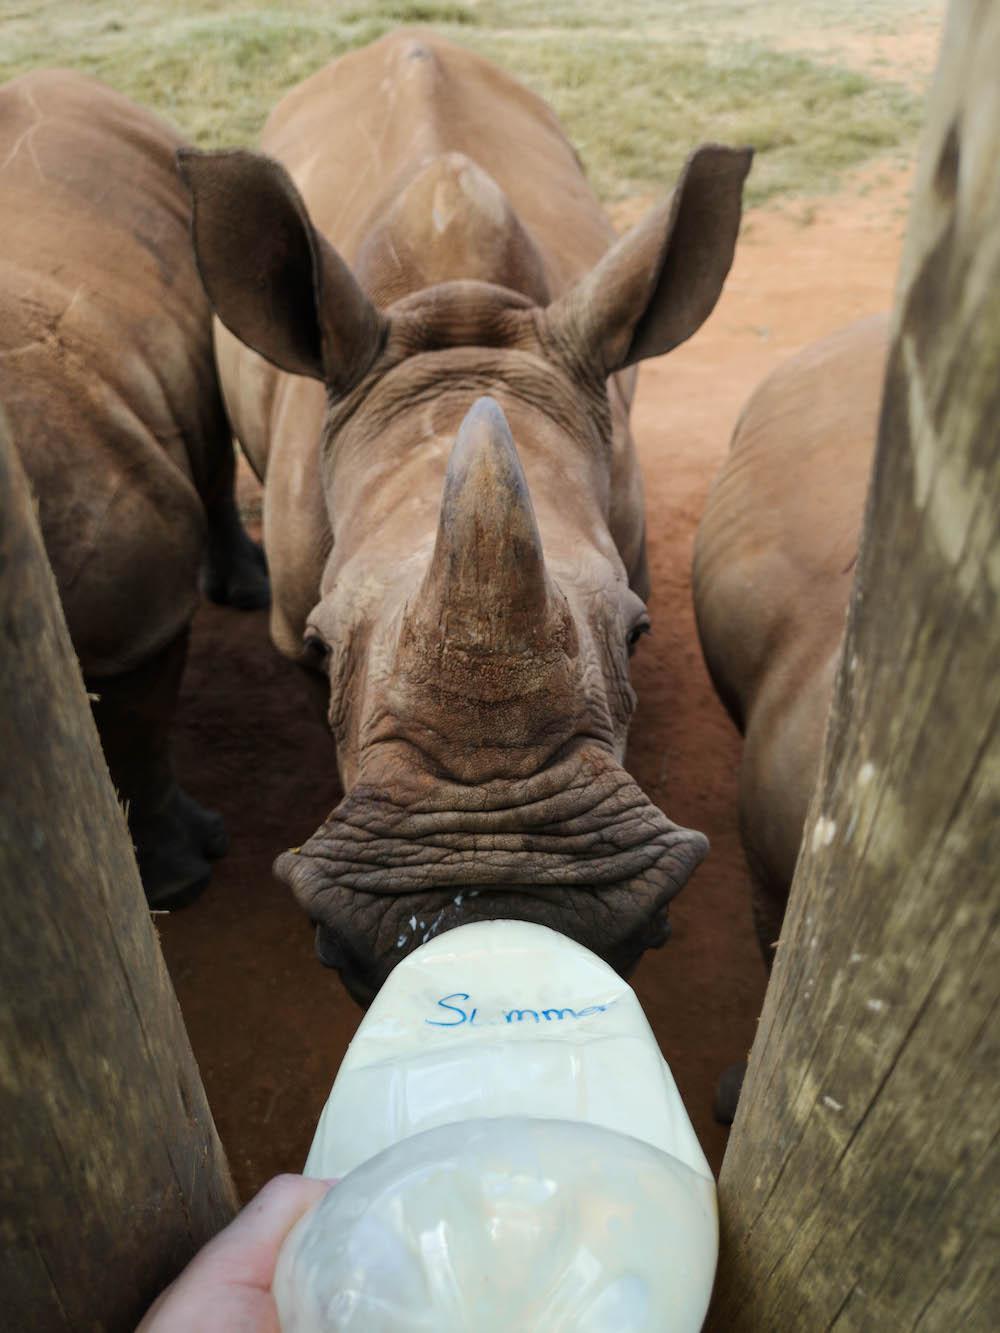 baby neushoorn care for wild rhino sanctuary